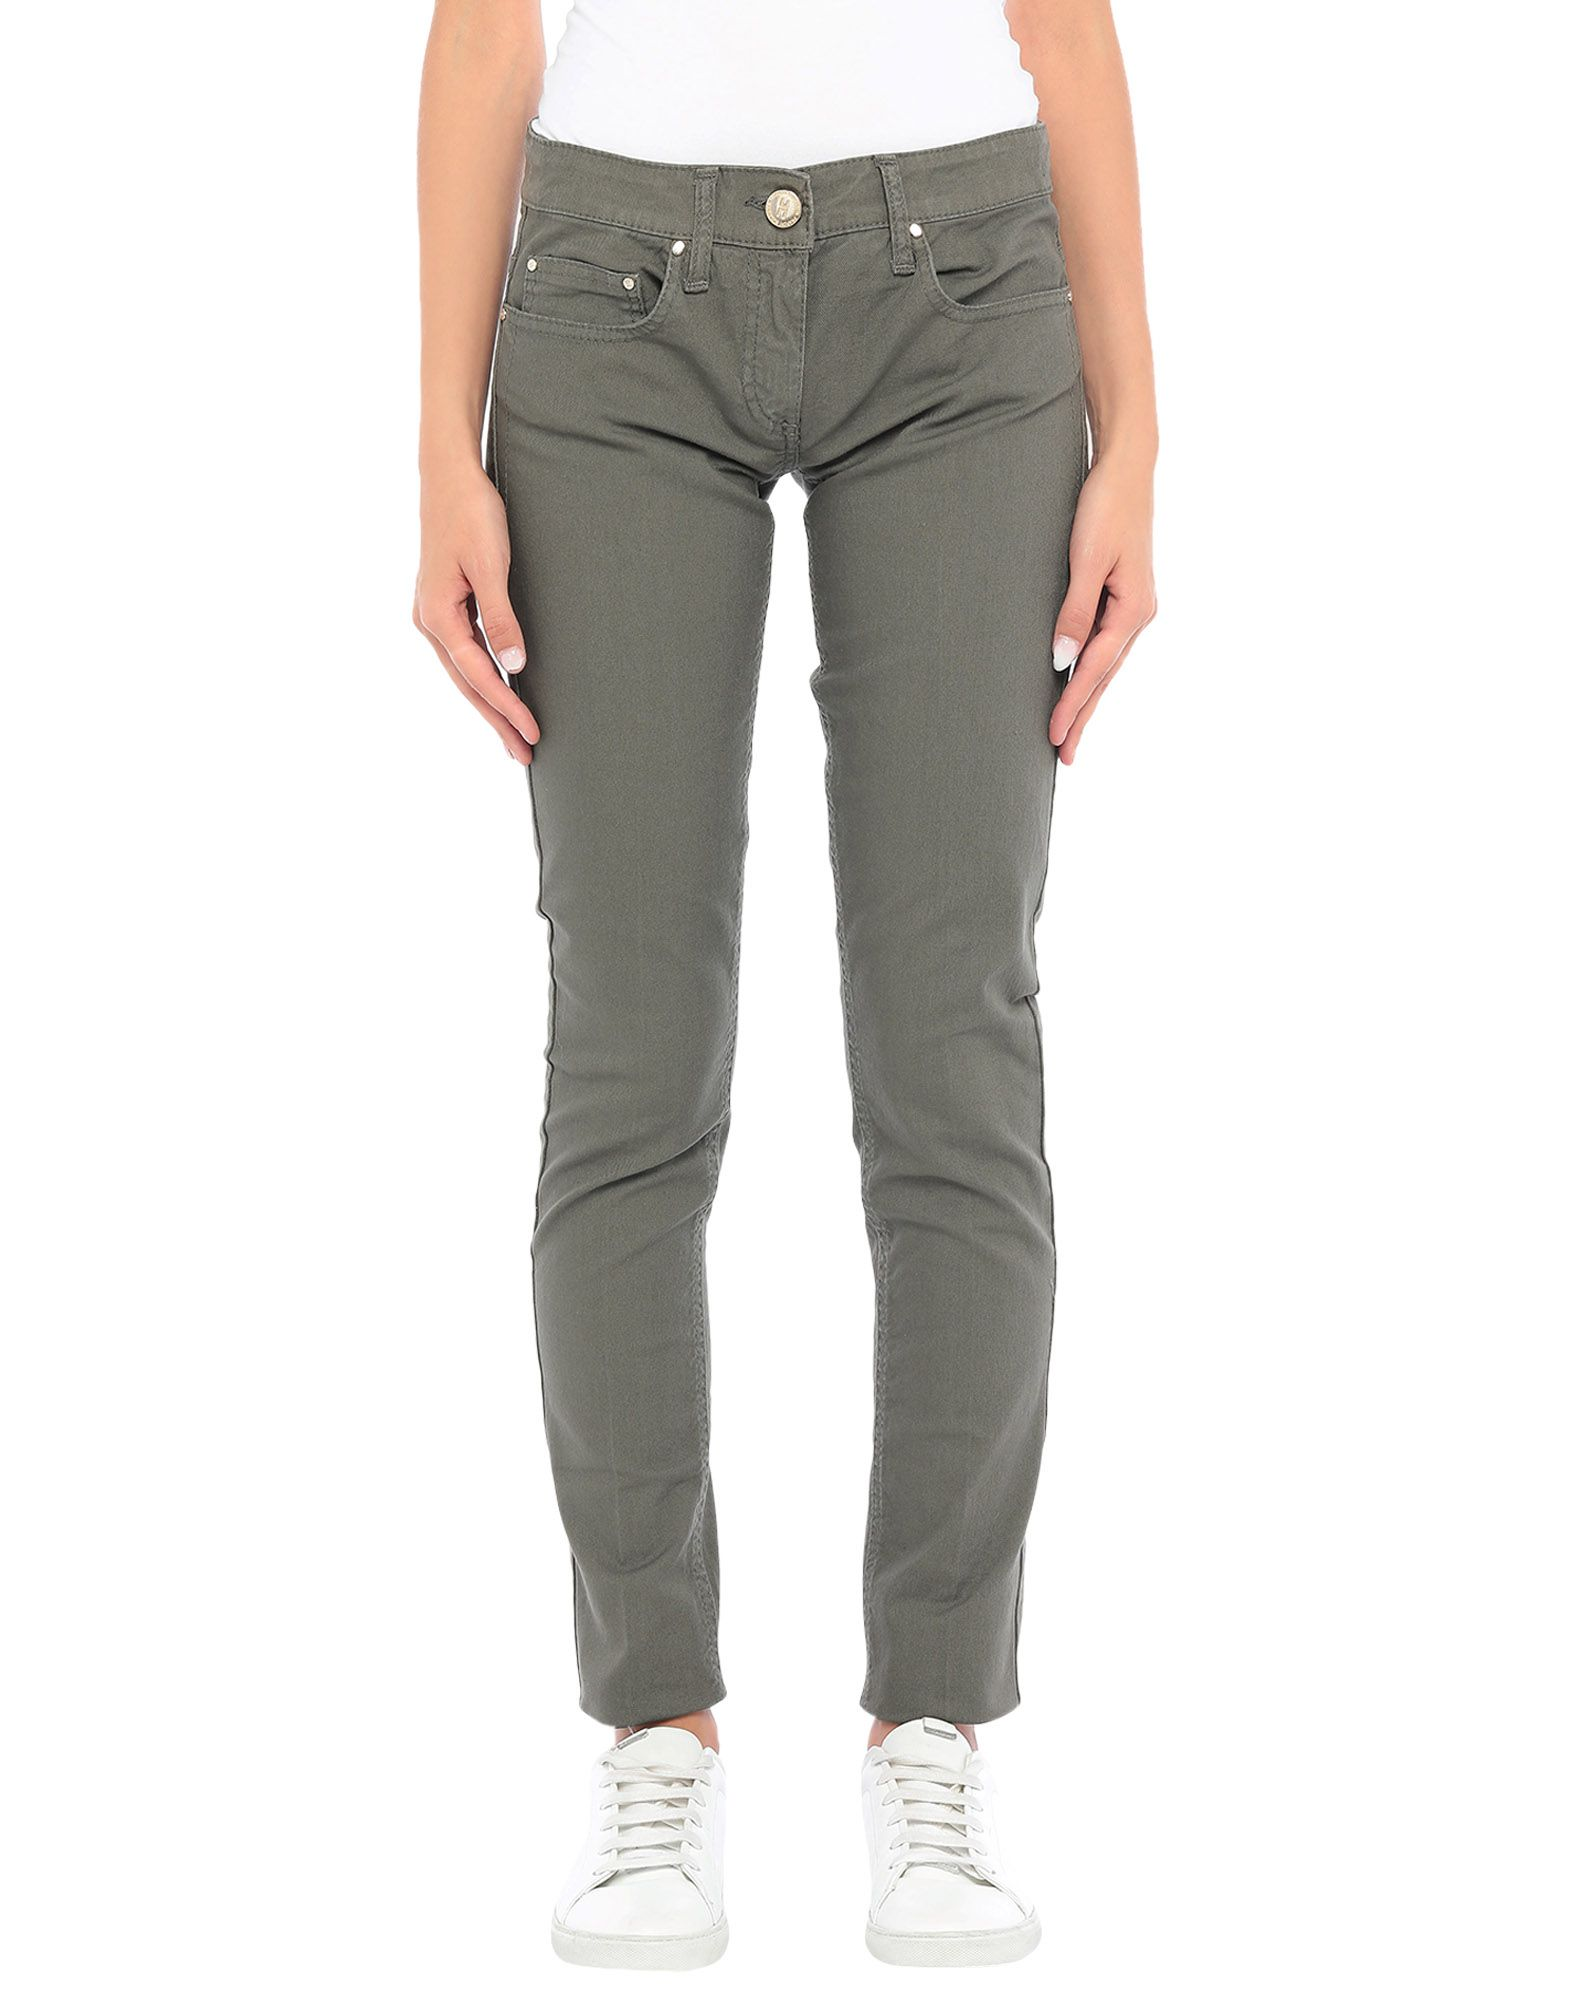 ELISABETTA FRANCHI JEANS for CELYN B. Джинсовые брюки